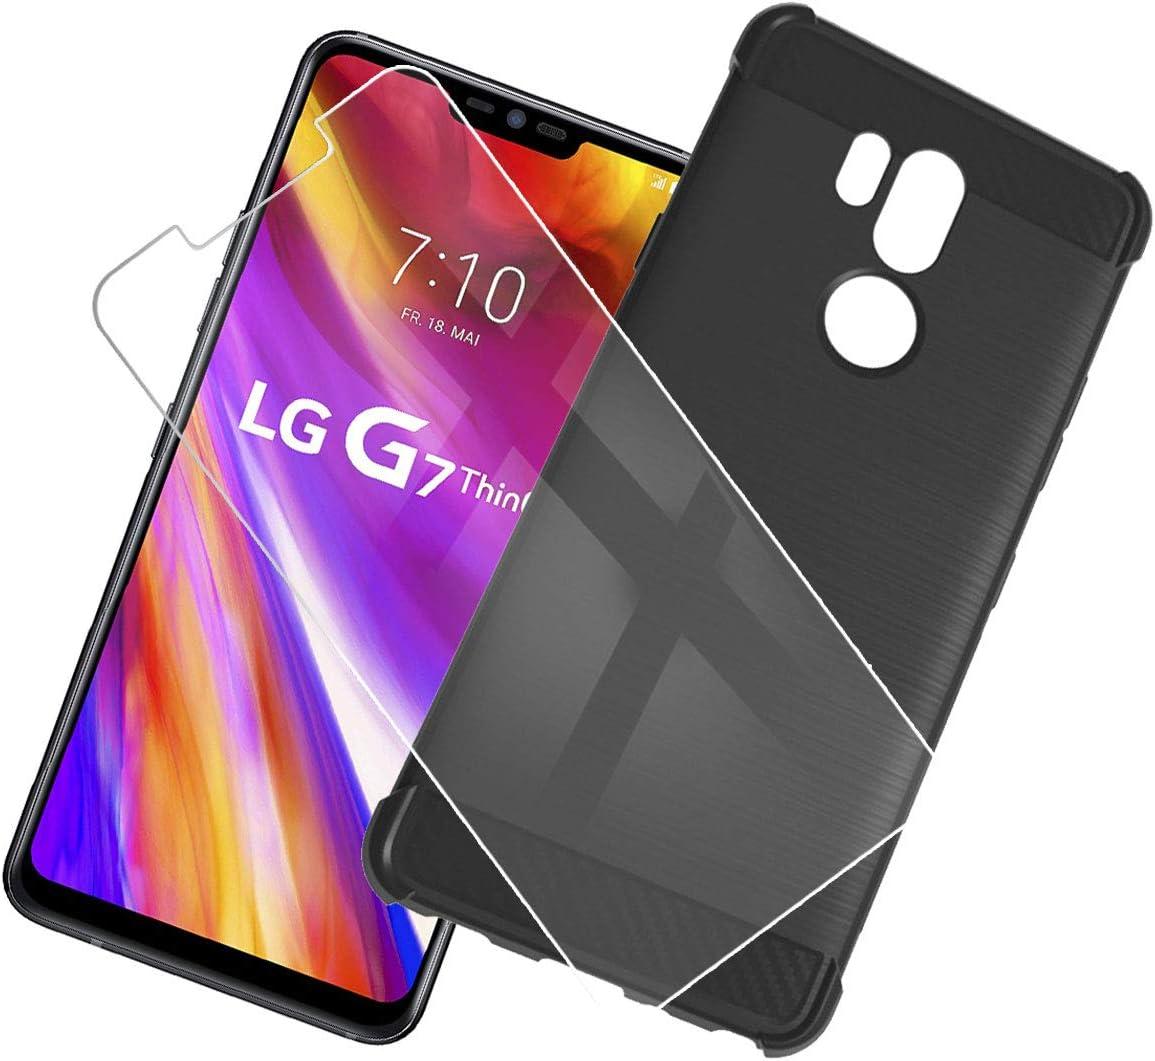 QFSM Funda + Cristal Templado para LG G7 Thinq/LG G7 Silicona ...